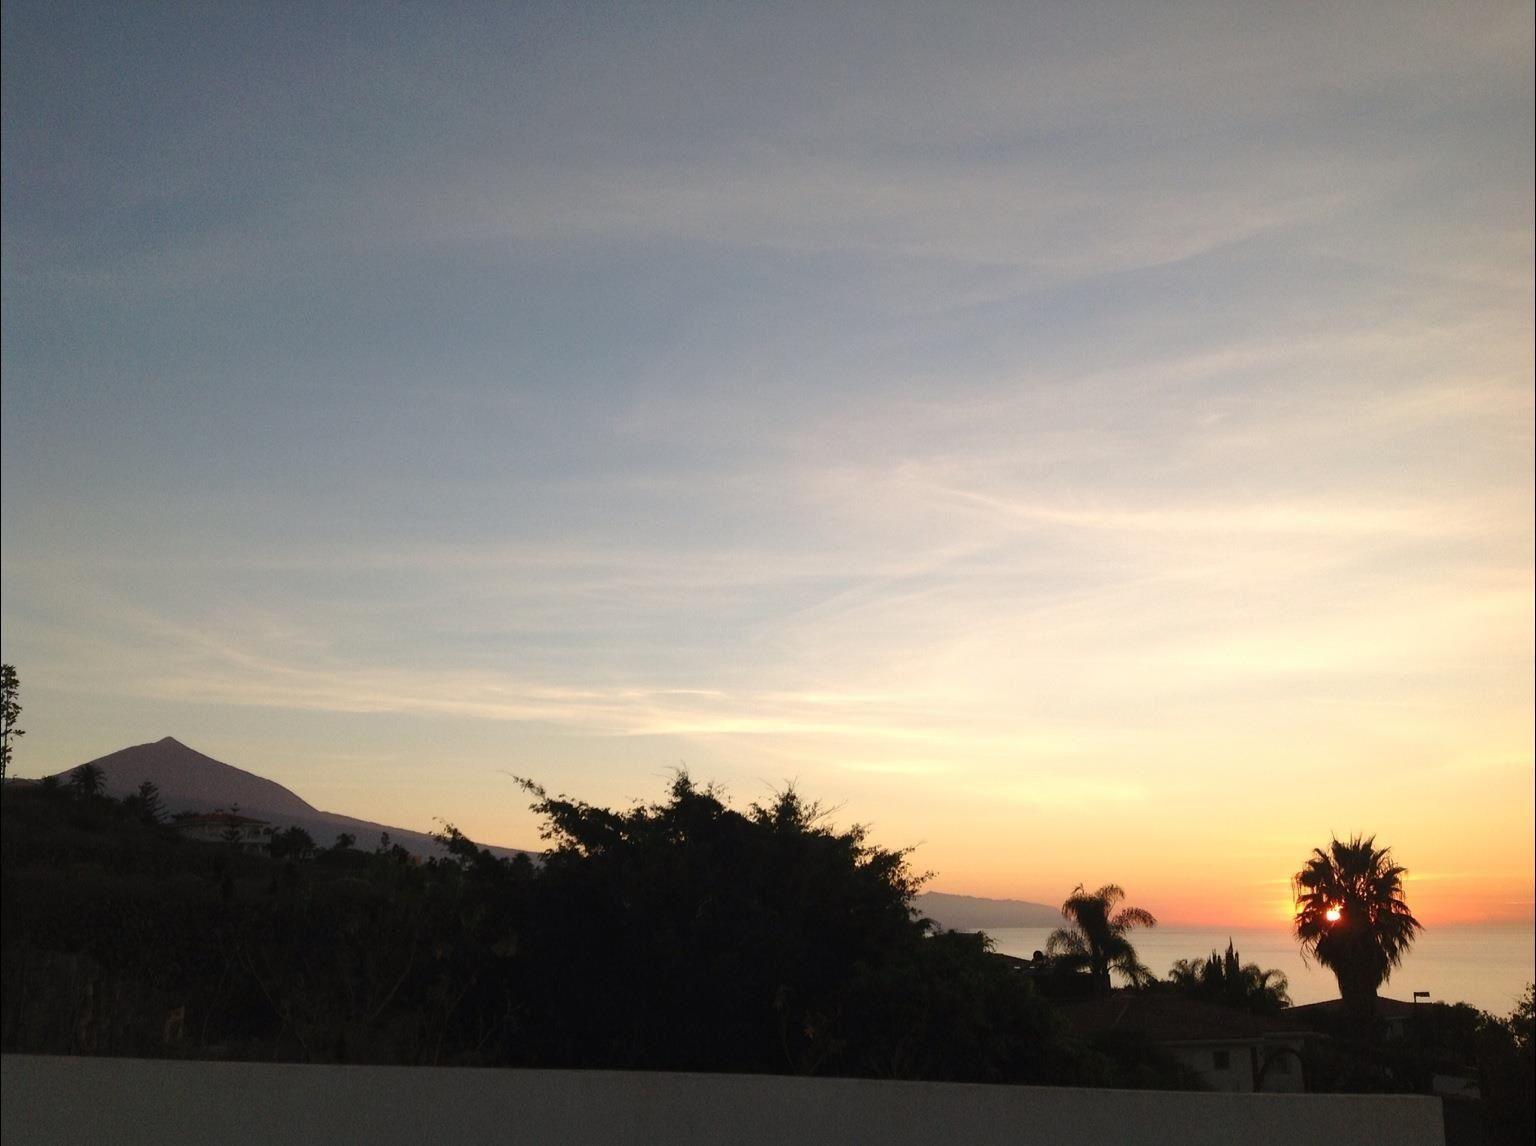 Atardecer en El Sauzal, Tenerife